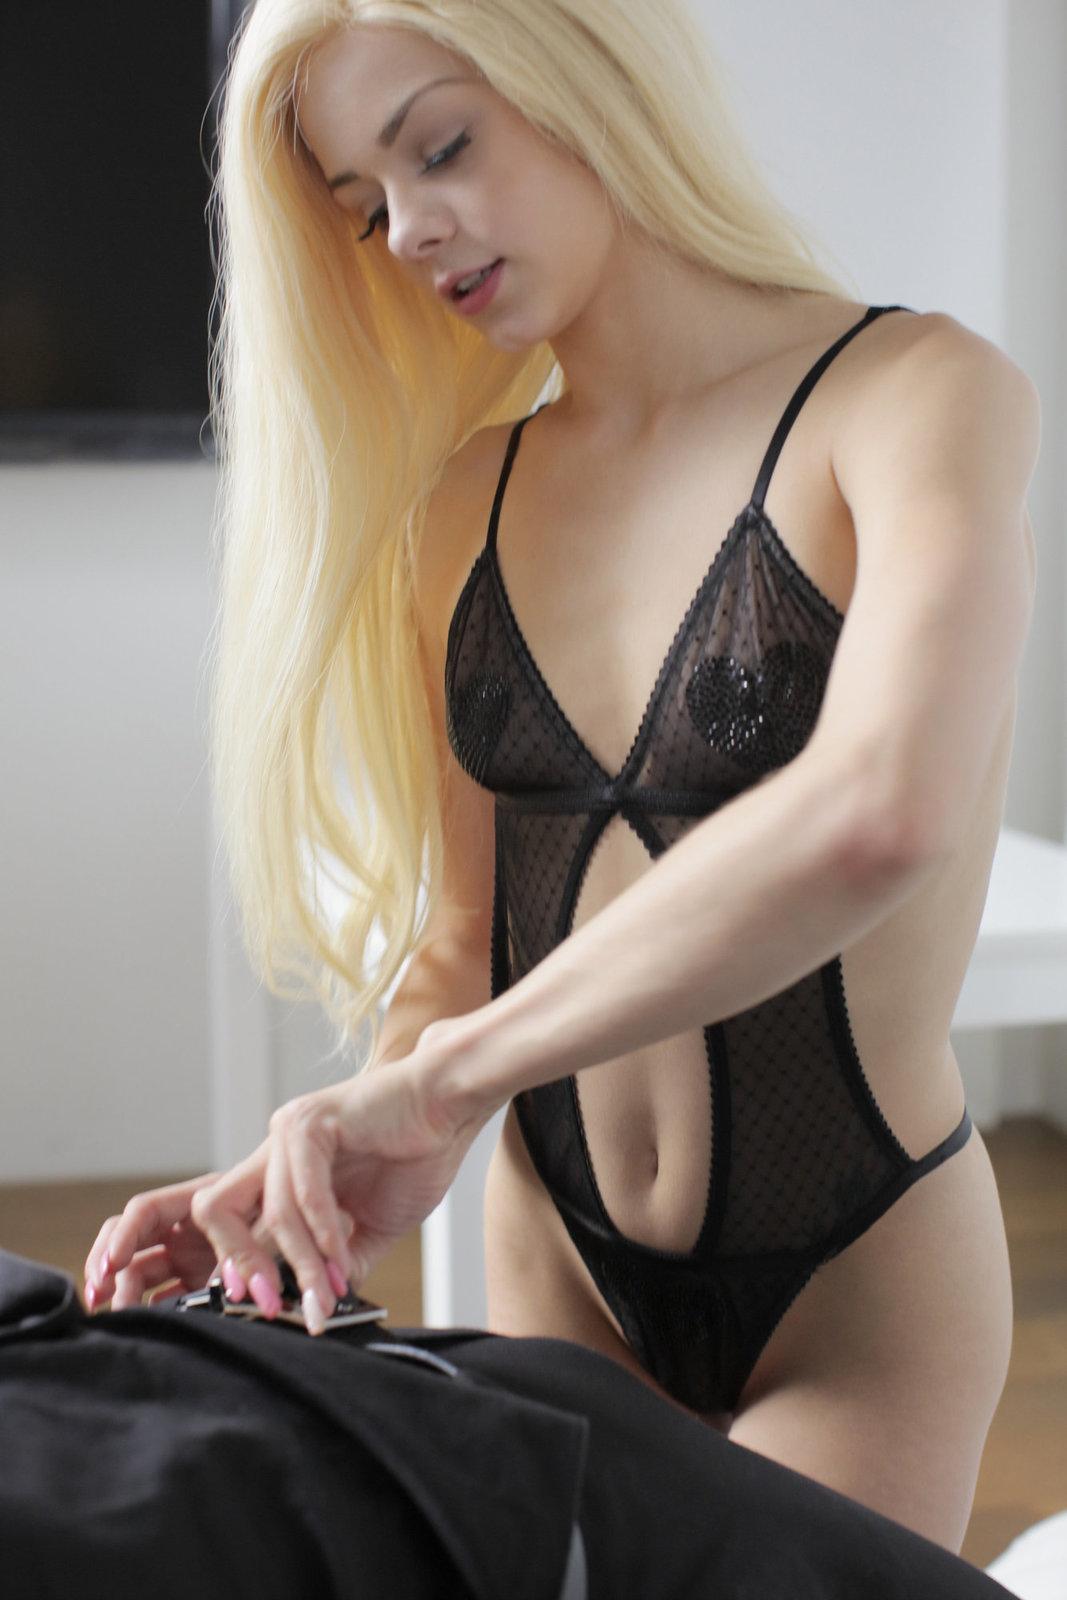 Elsa jean fantasy porneq